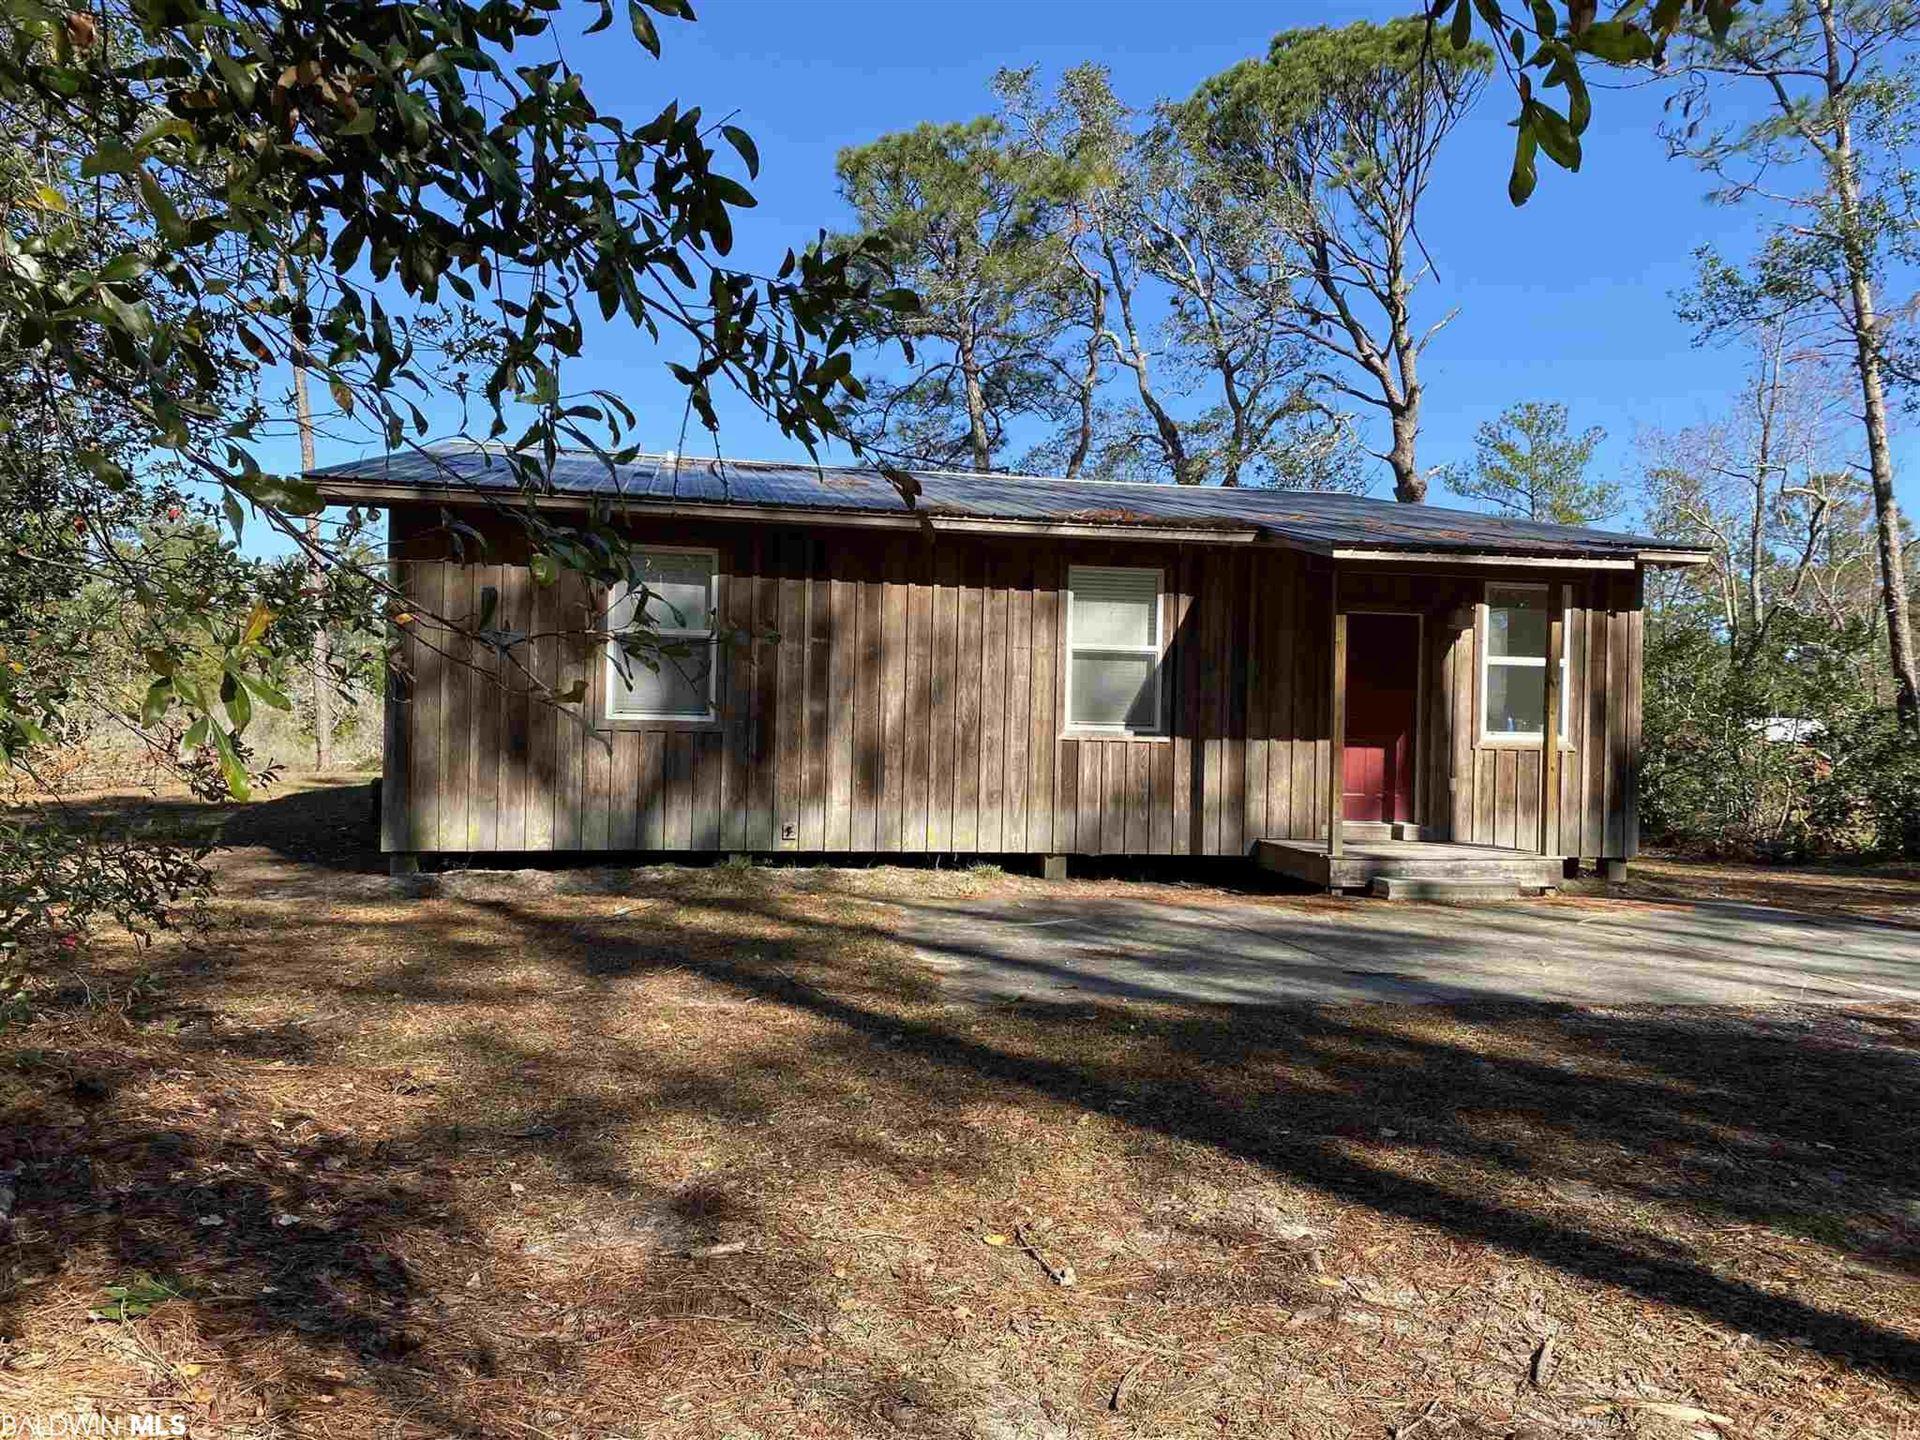 18765 Pine Acres Rd, Gulf Shores, AL 36542 - #: 307906